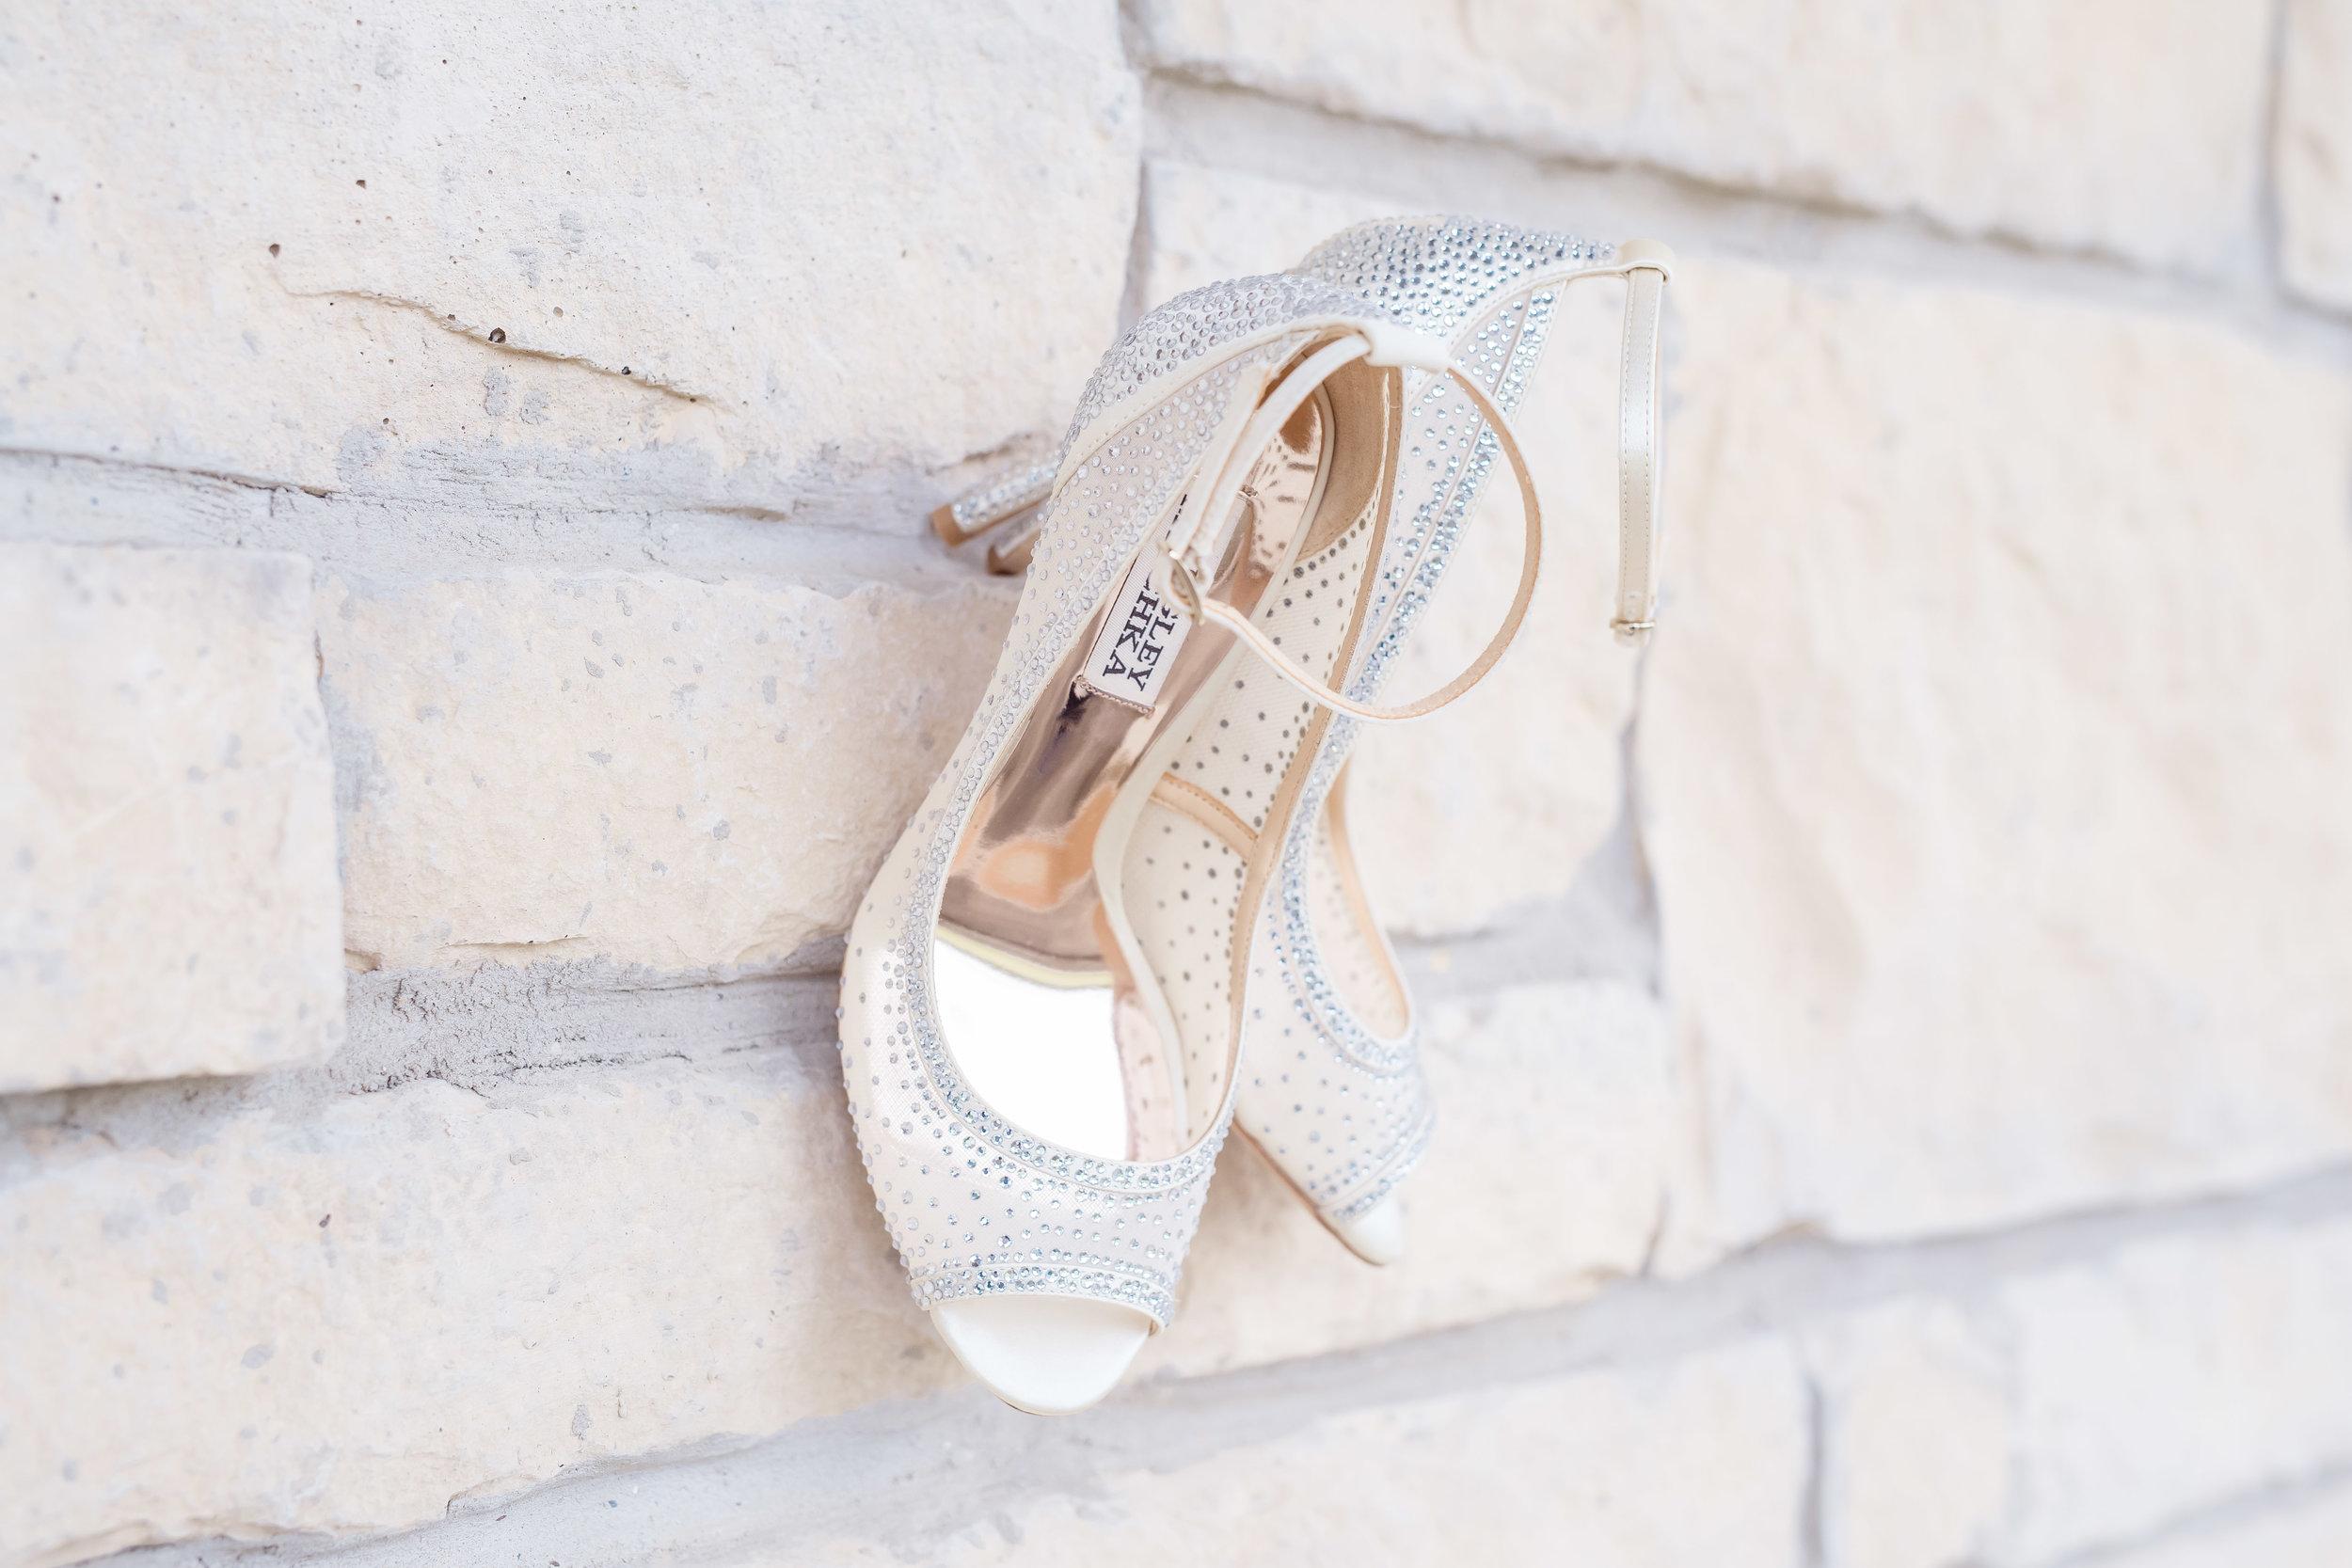 Wedding Shoes - Badgley Mischka - from Nordstrom.com